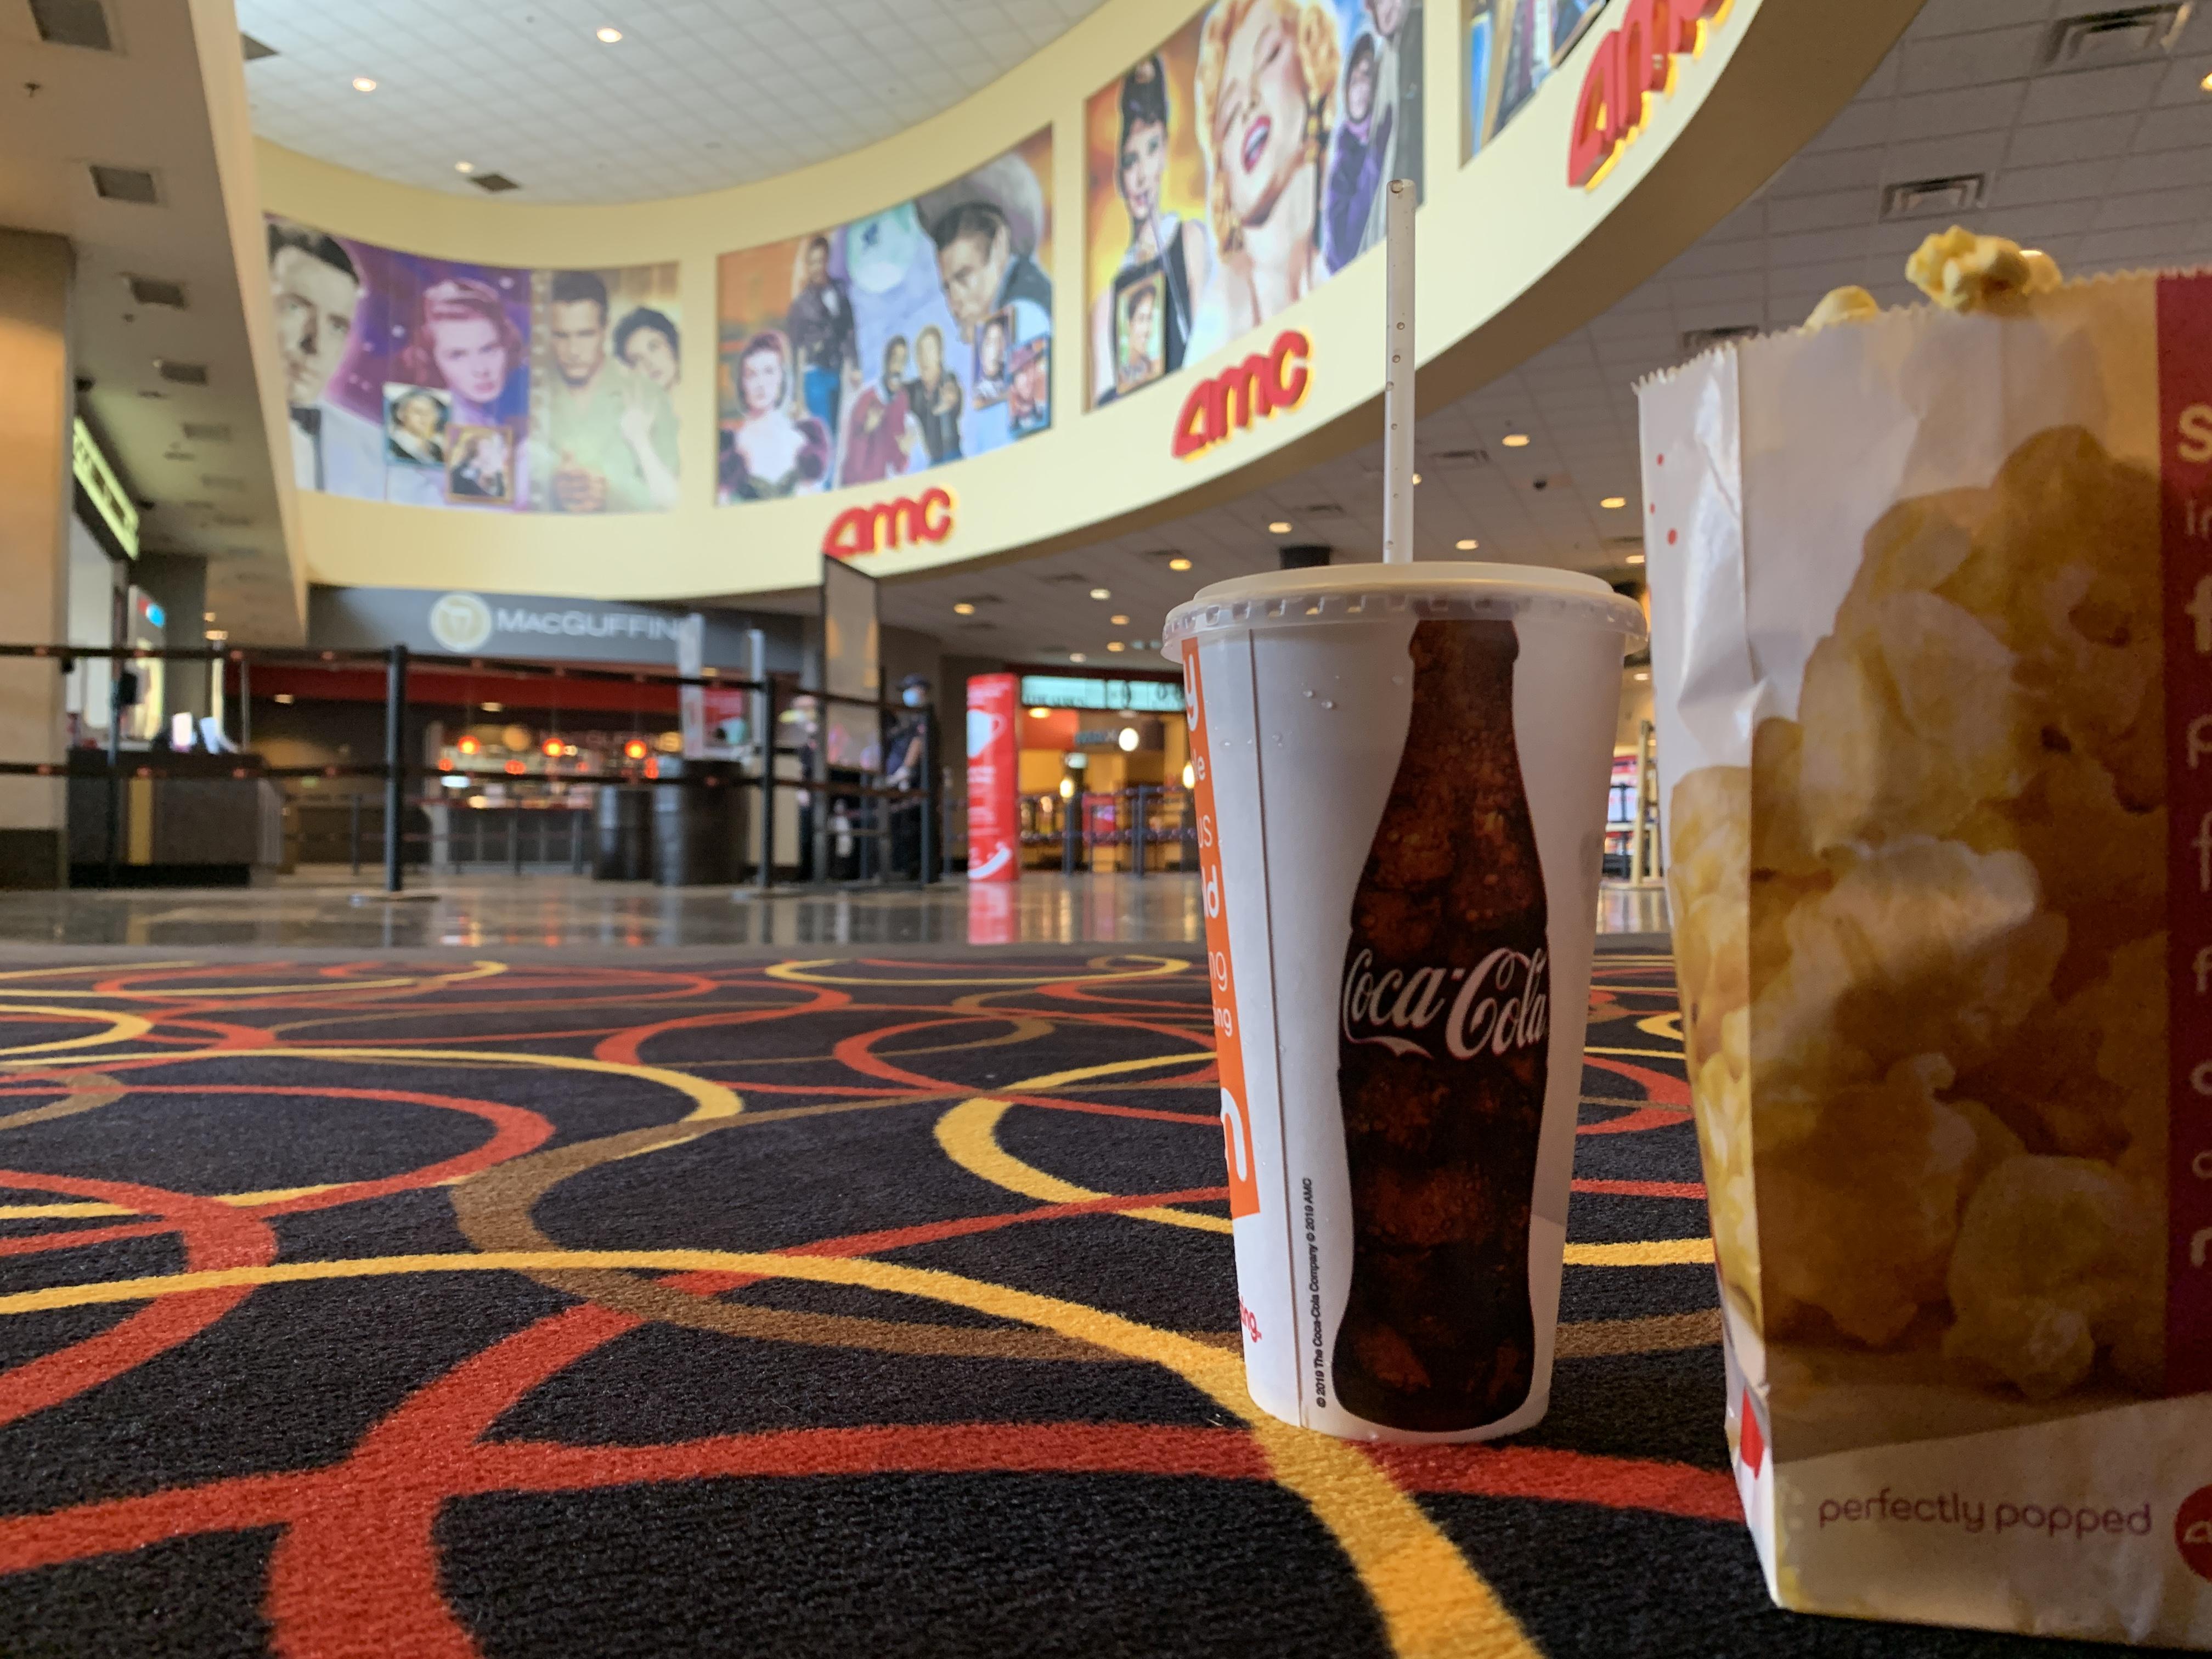 Halloween 2020 Pint Glass Amc Moviegoers head back to theaters following monthslong coronavirus